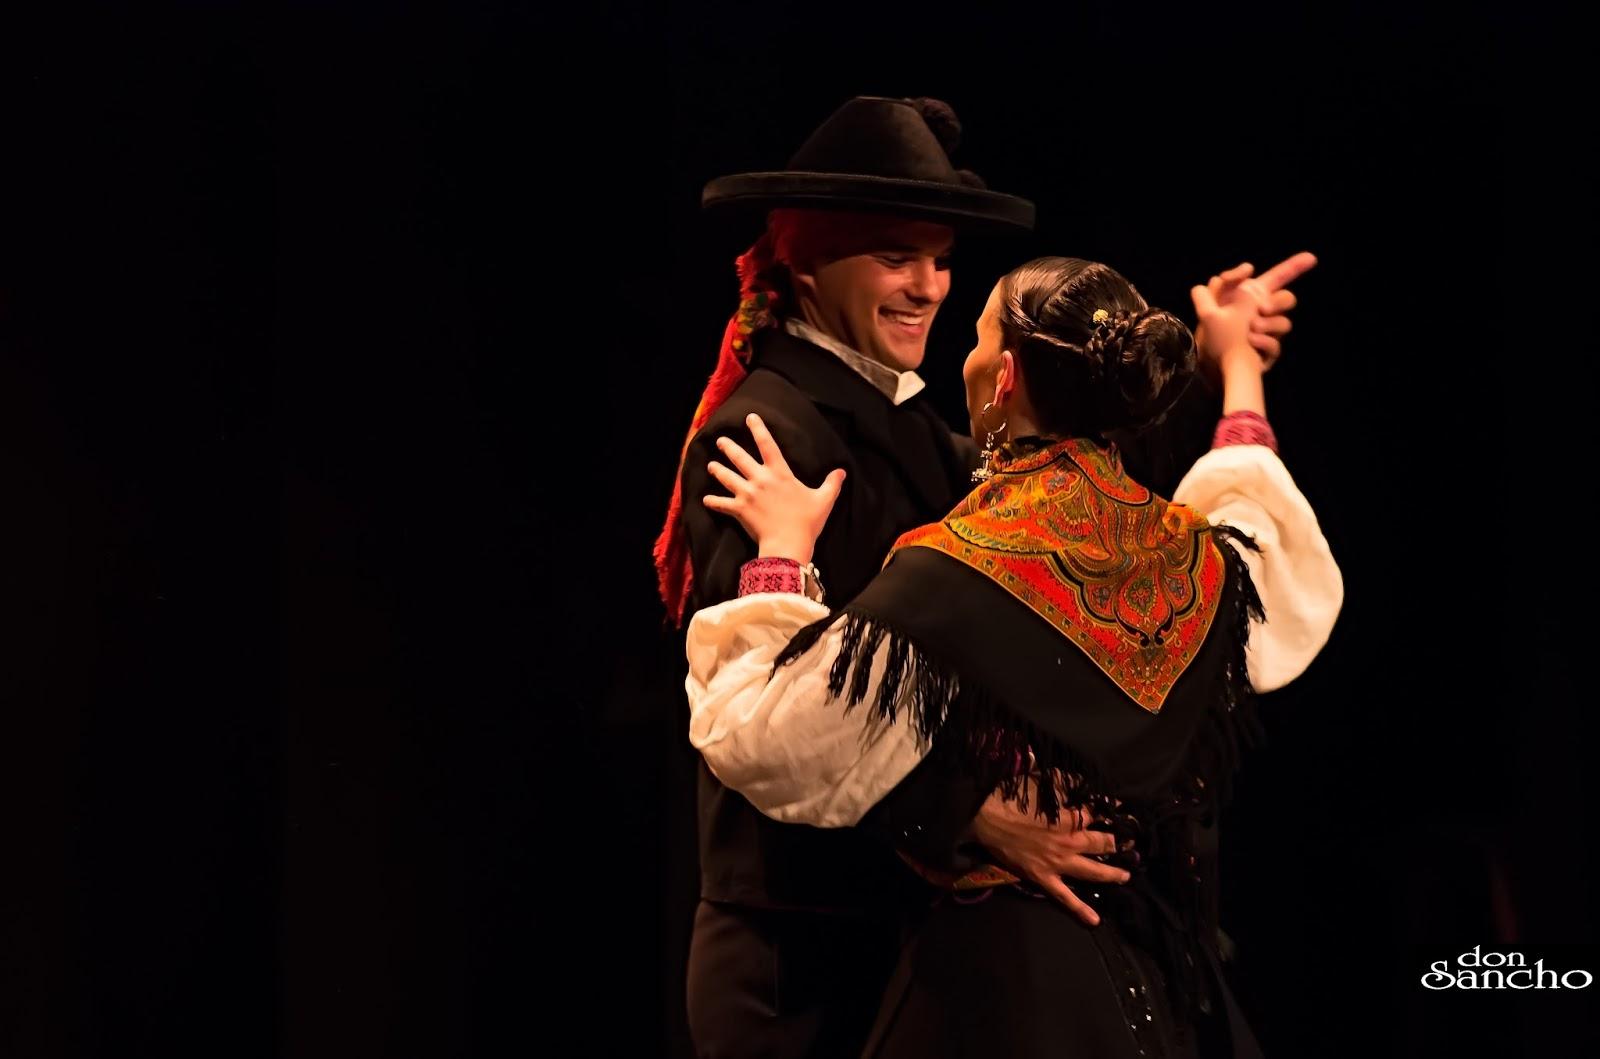 DON SANCHO. Difusión de la Cultura Tradicional de Zamora ... - photo#18